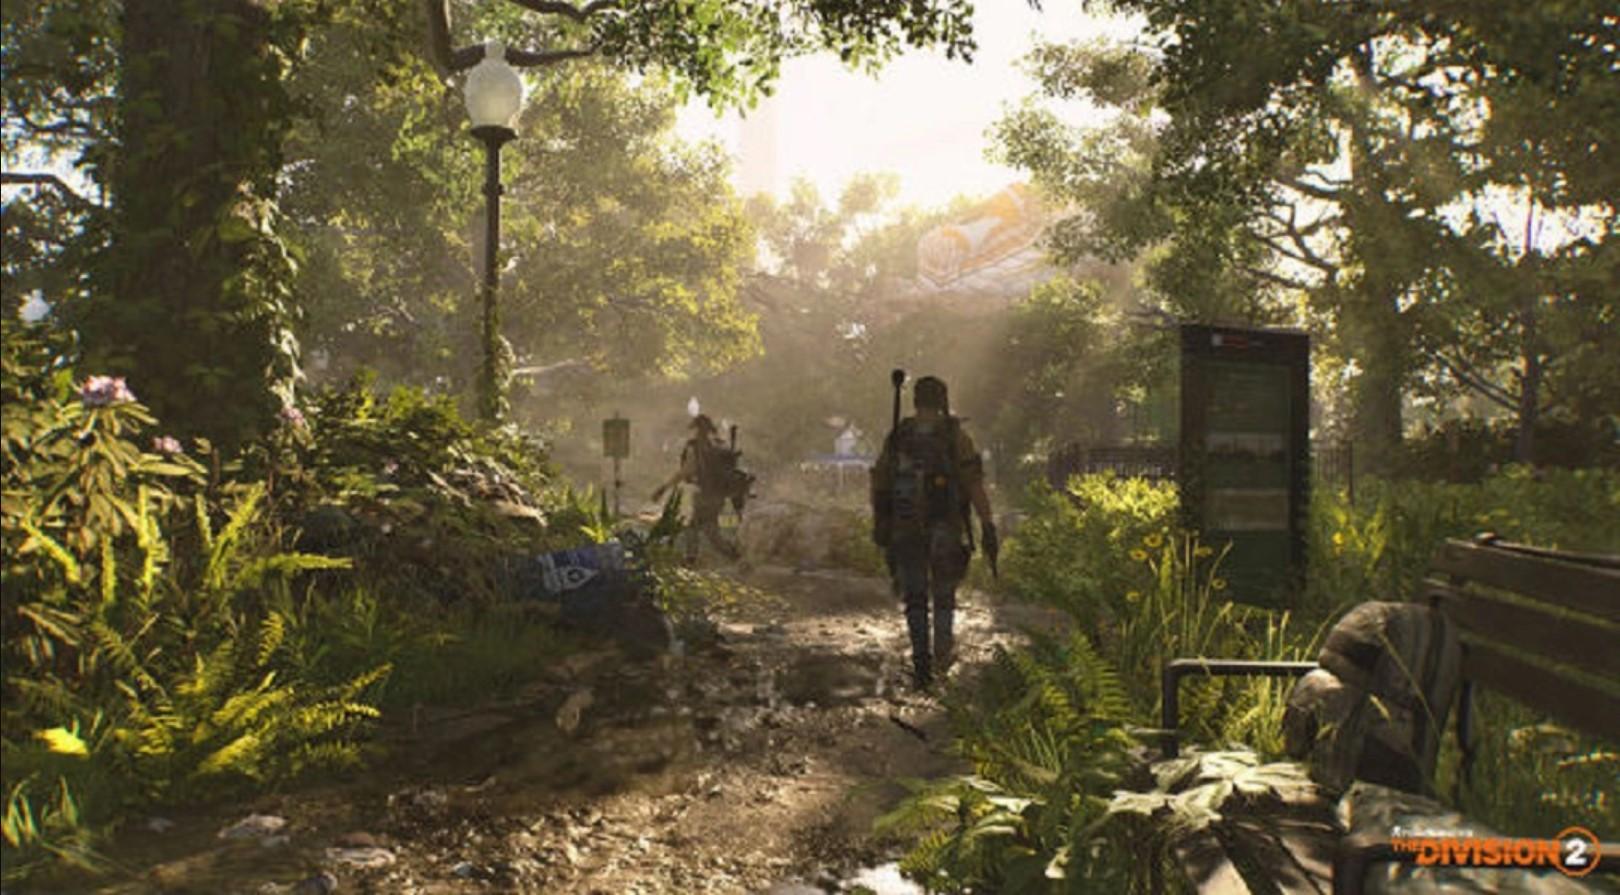 <b>育碧:《全境封锁2》战役长度将比1代游戏长很多</b>